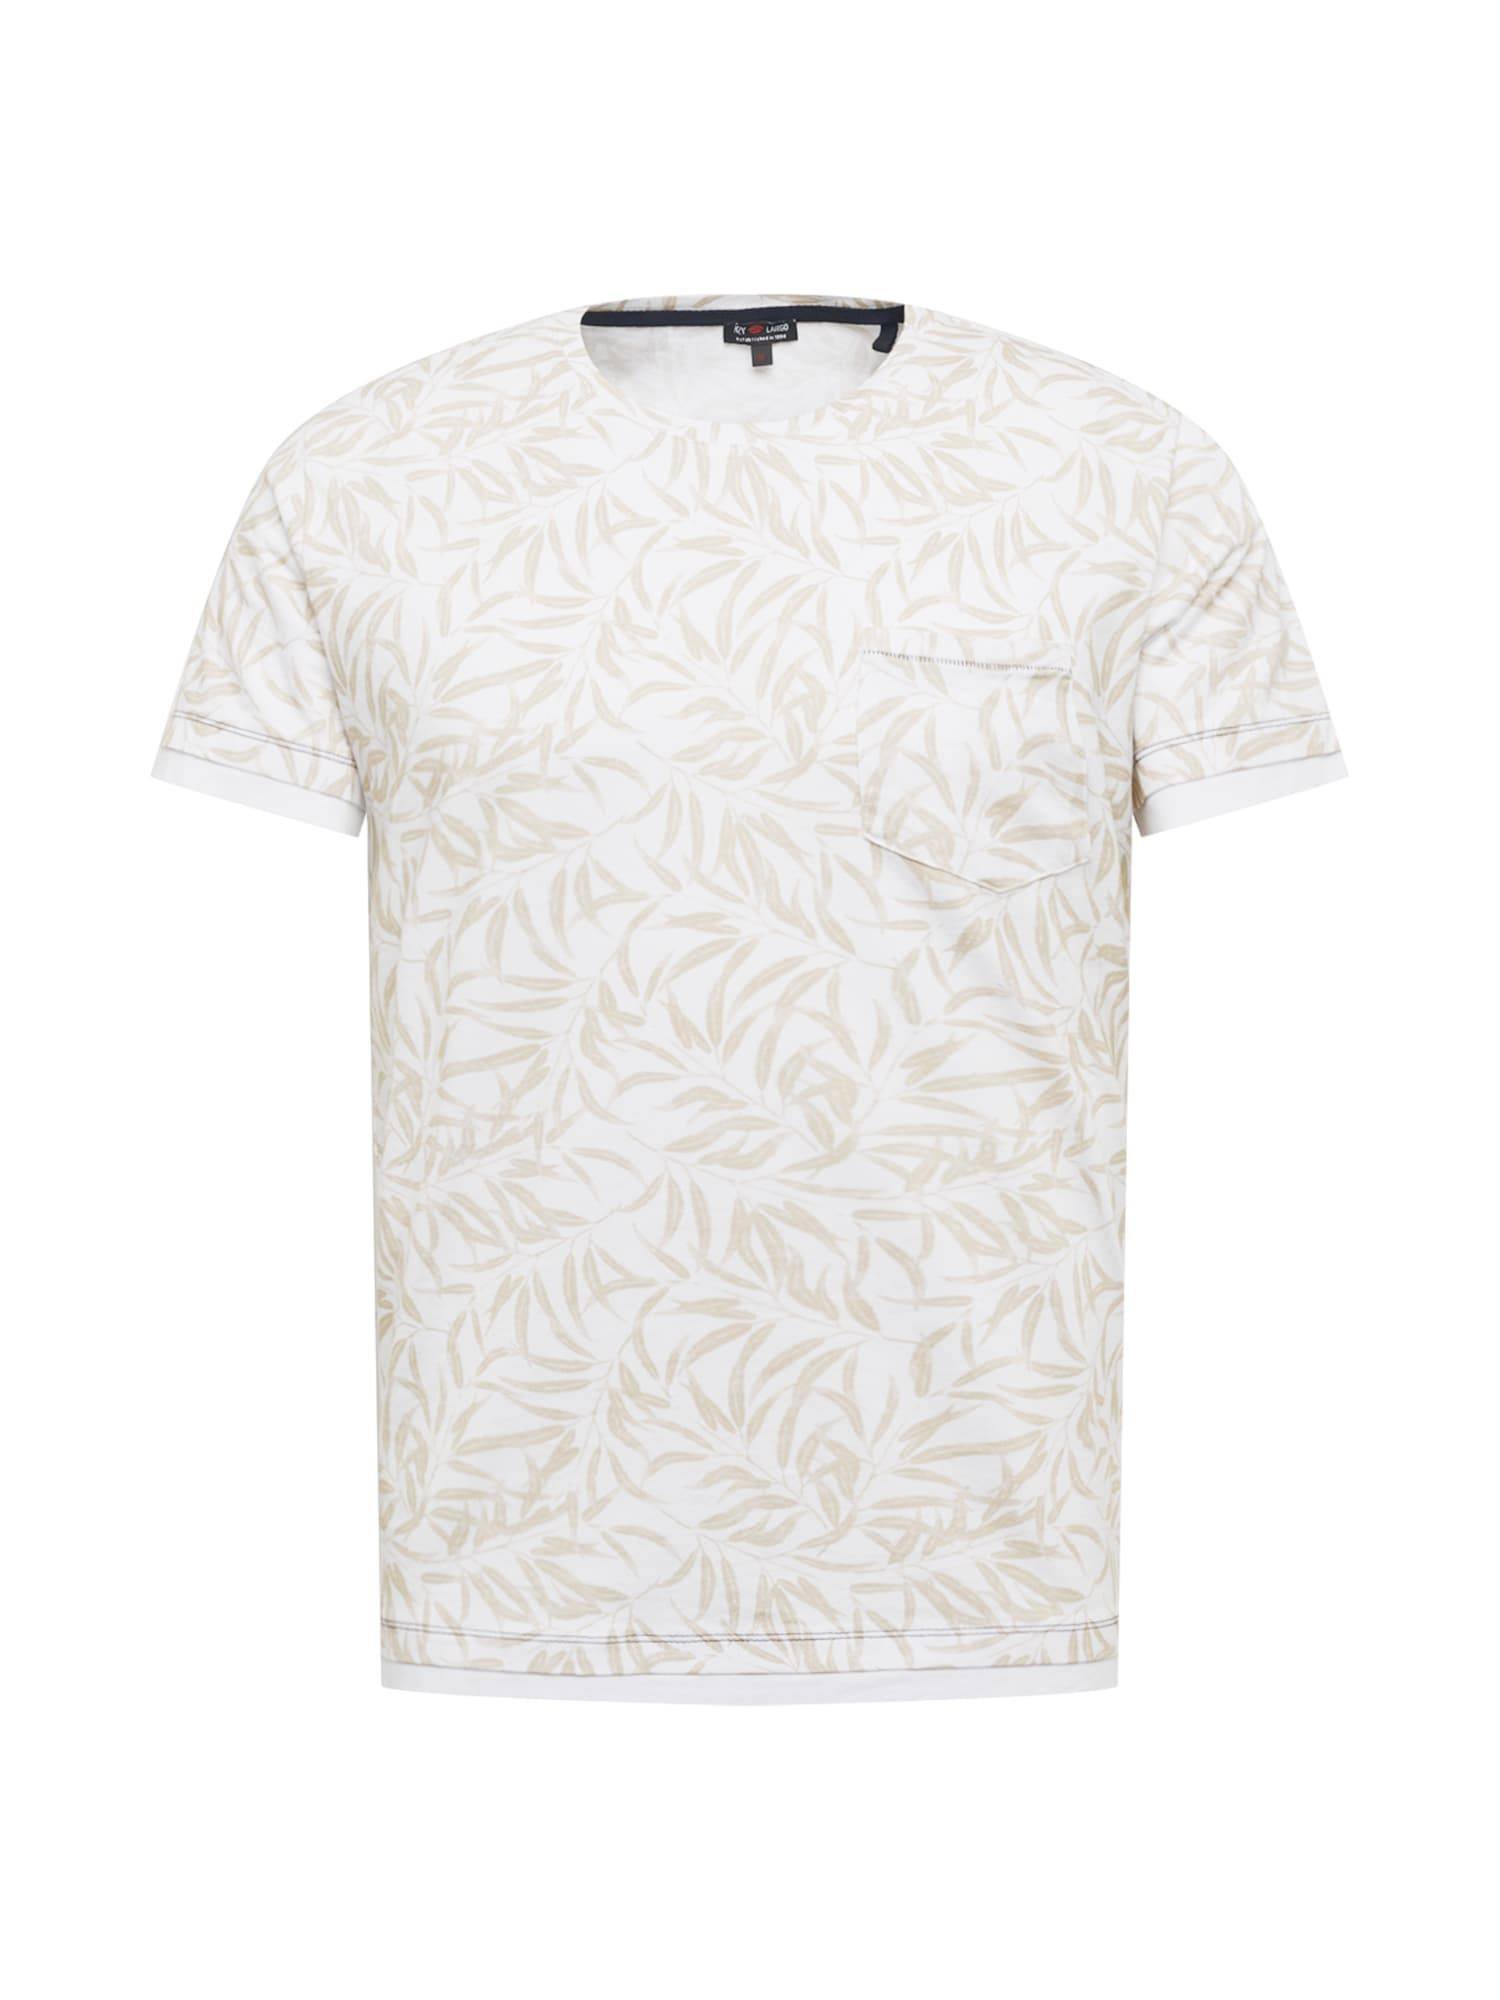 Key Largo T-Shirt 'LOCATION'  - Blanc - Taille: XXL - male